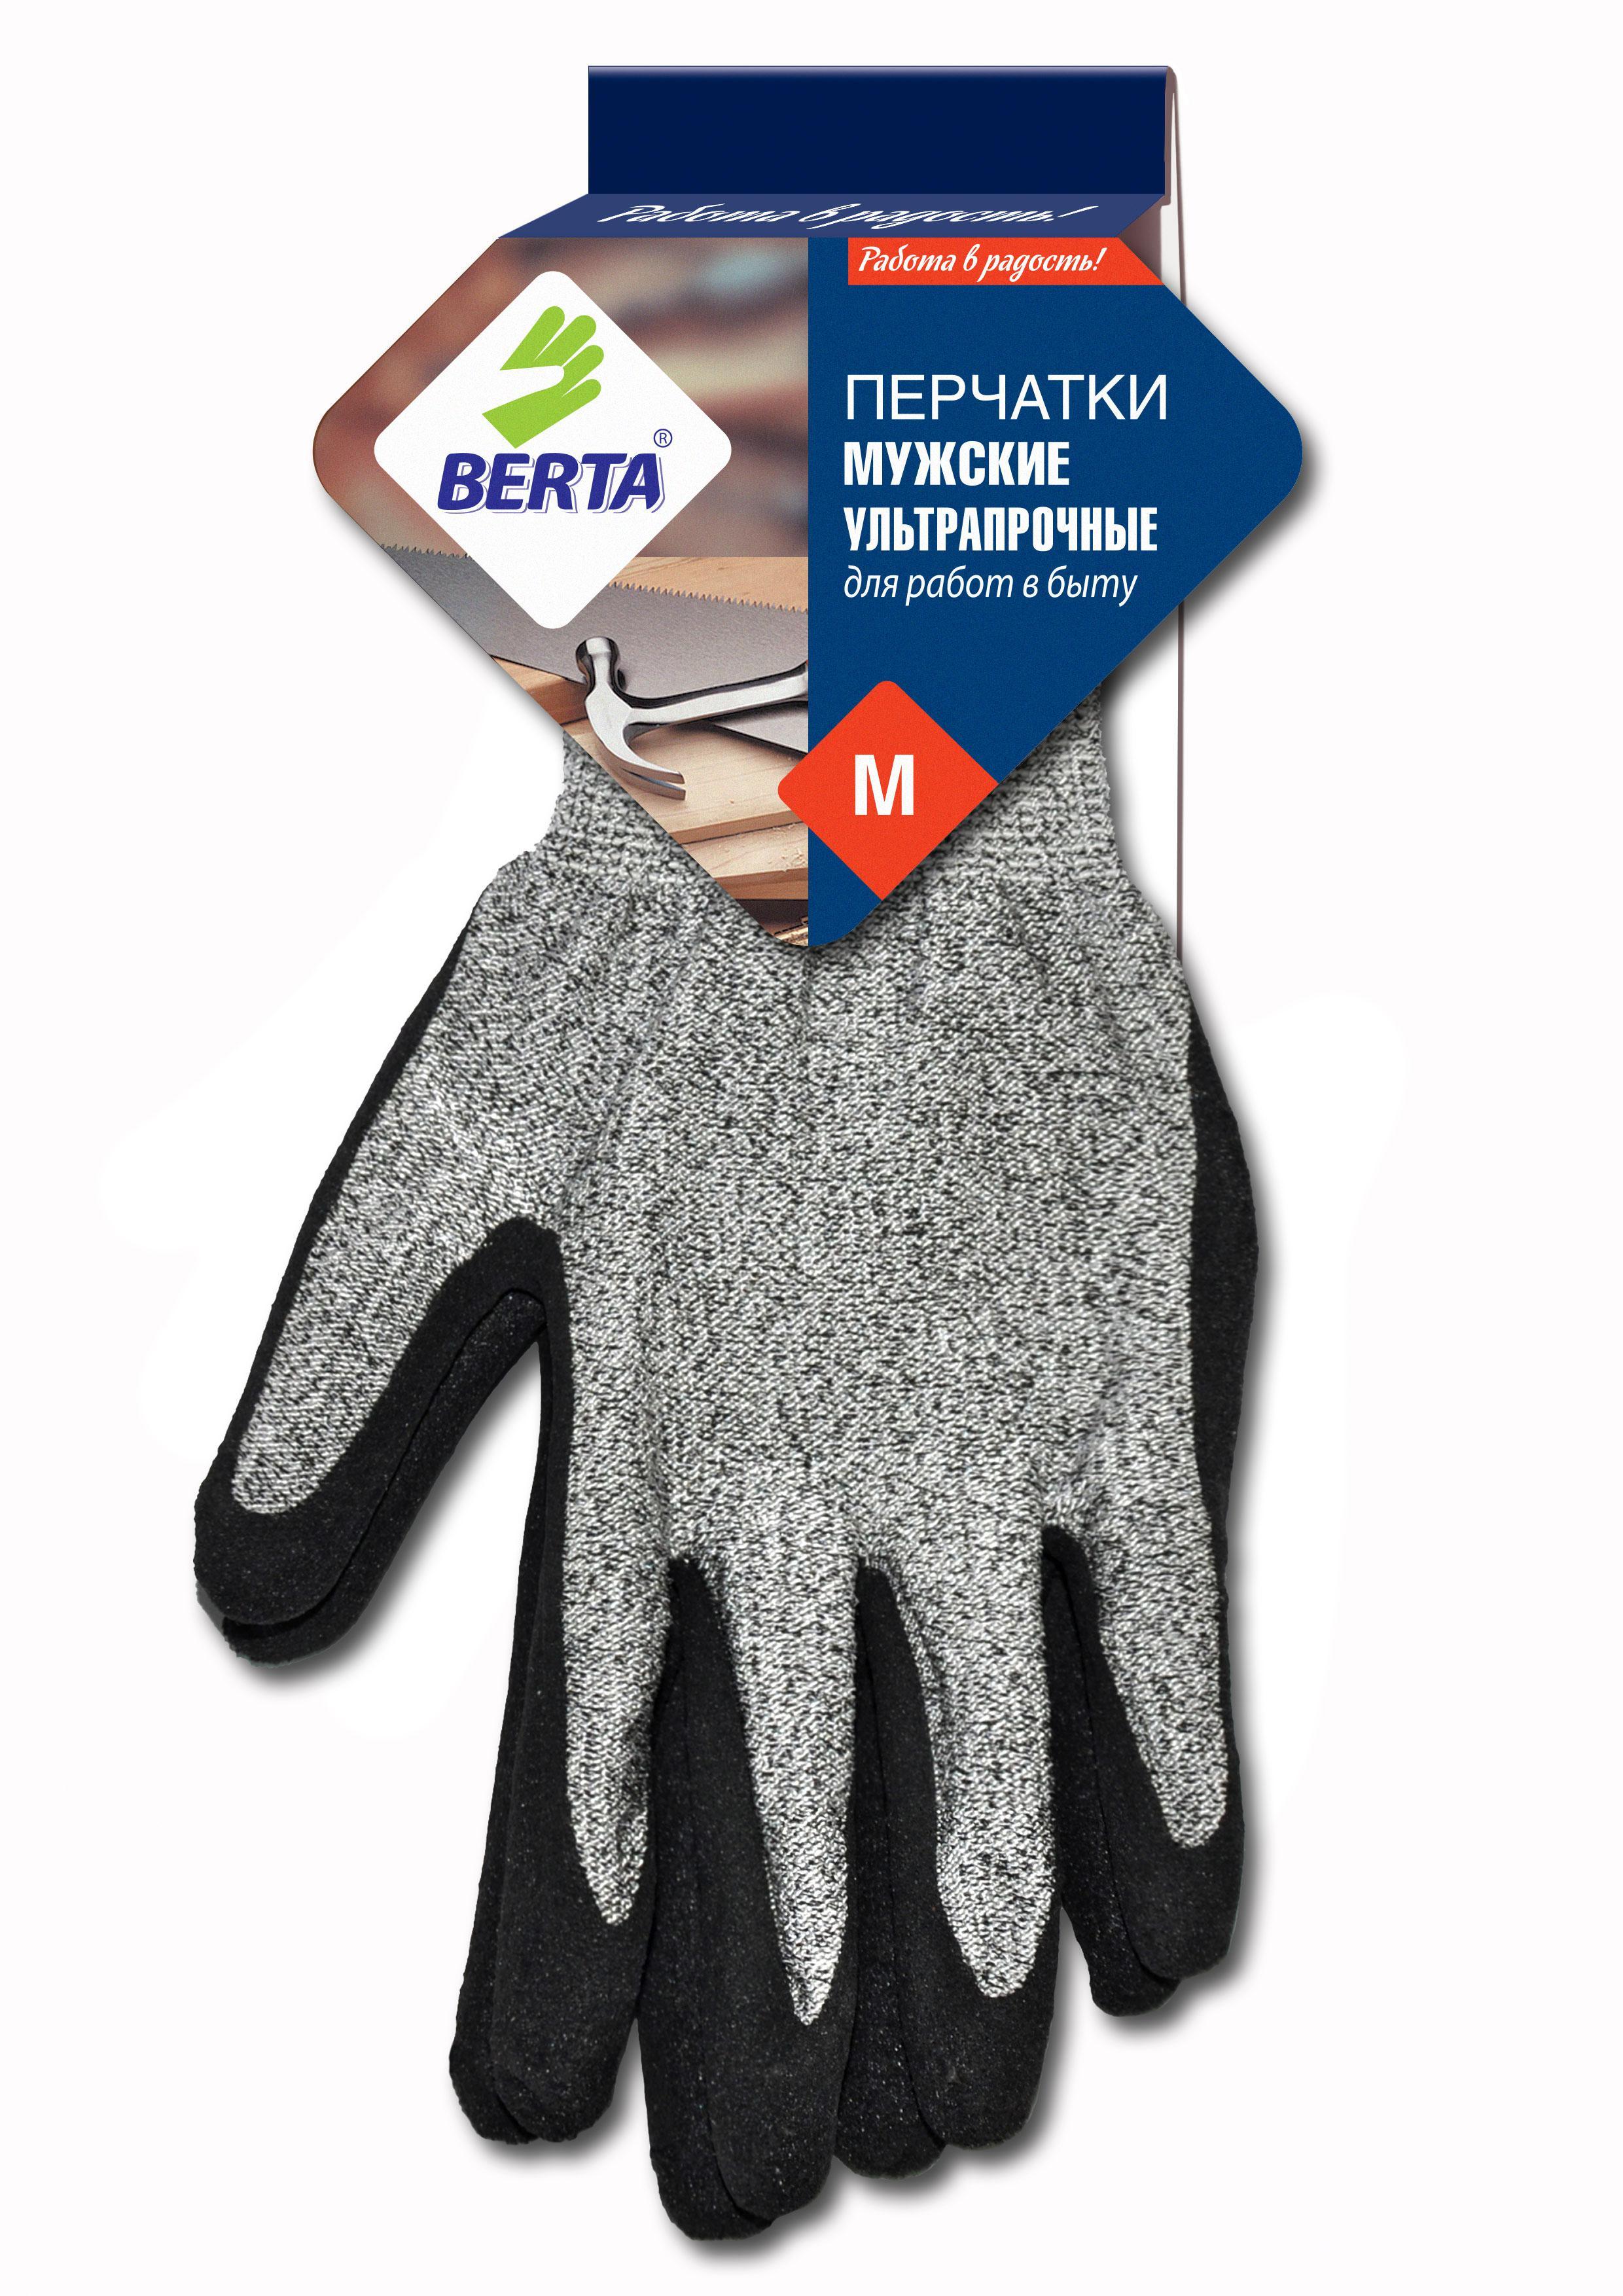 цена Перчатки БЕРТА 555 онлайн в 2017 году